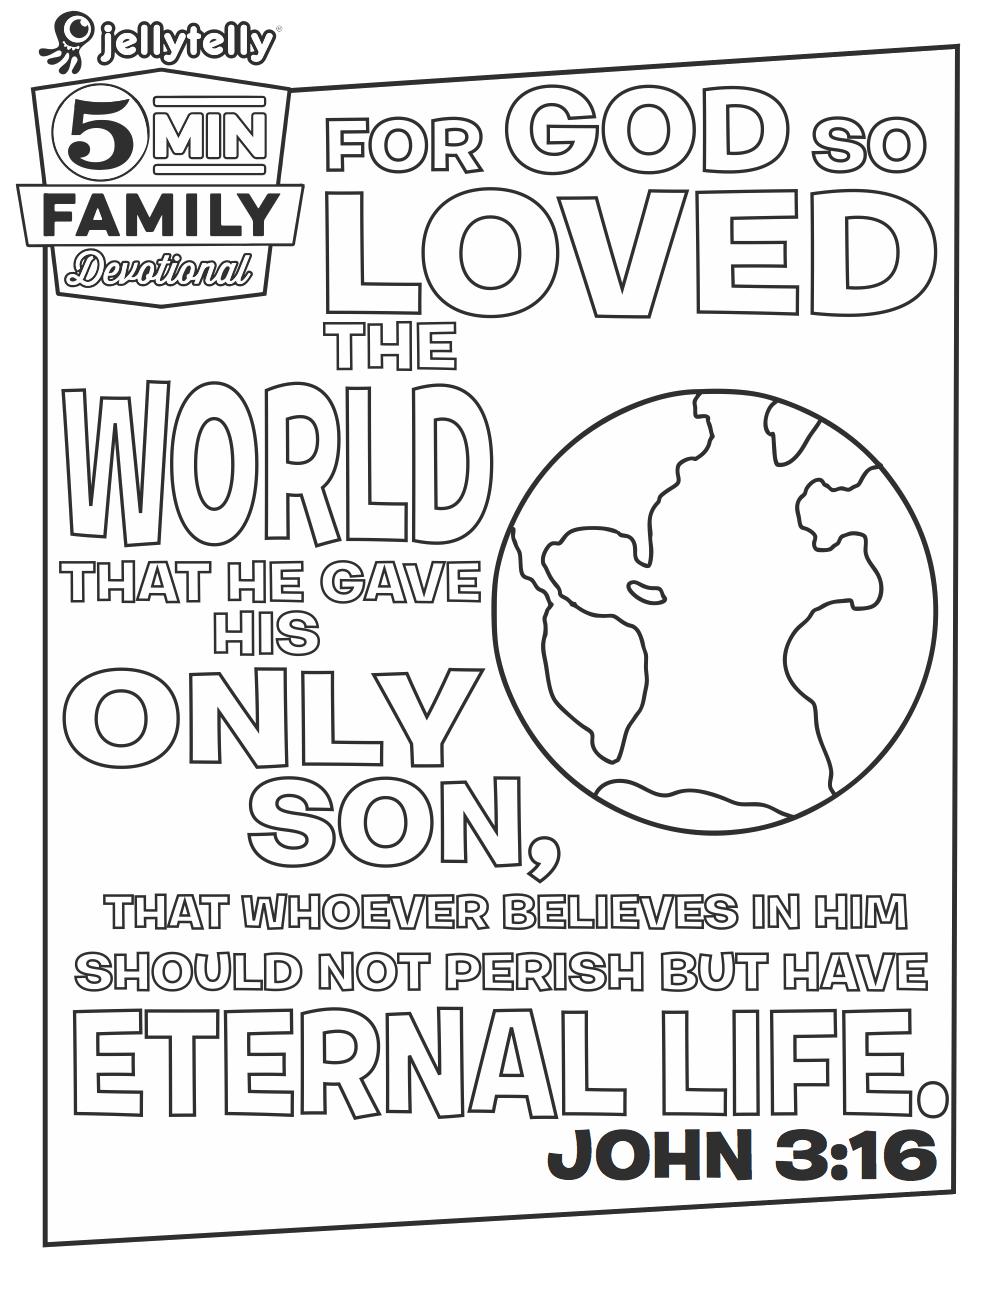 Jesus is the Messiah: Jesus 5 Minute Family Devotional ...